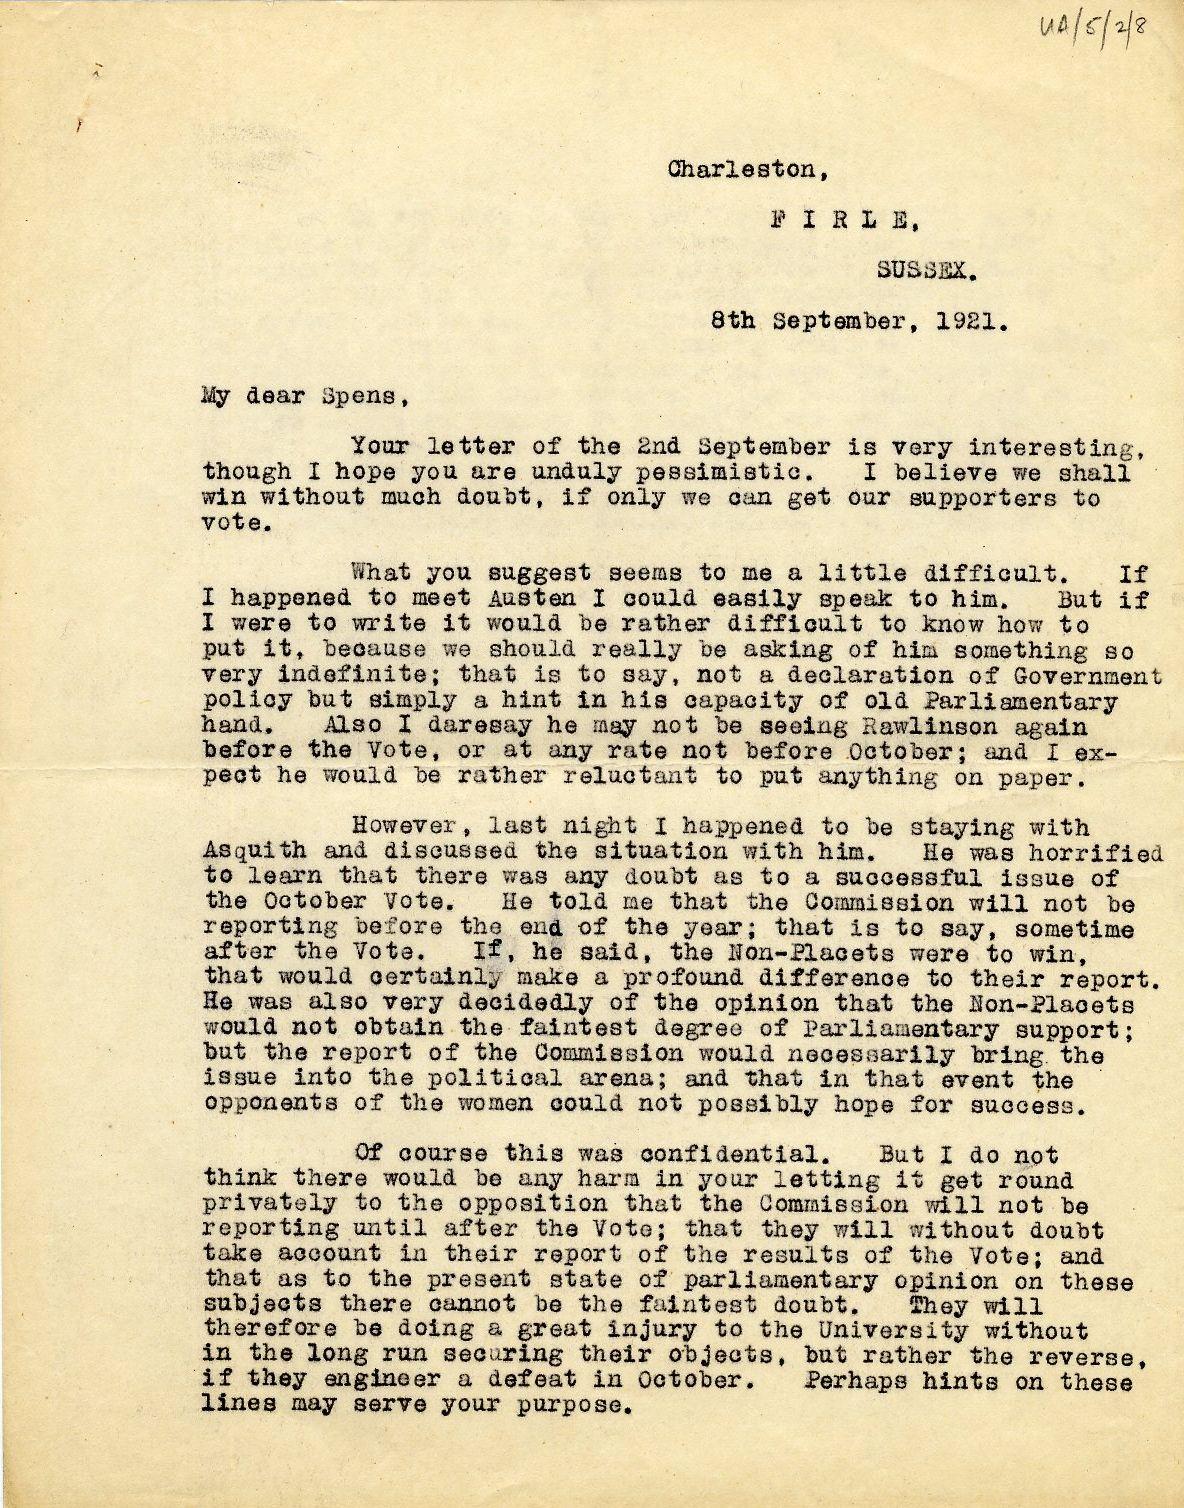 1921 letter from Keynes to Will Spens.  [JMK/UA/5/2/8]